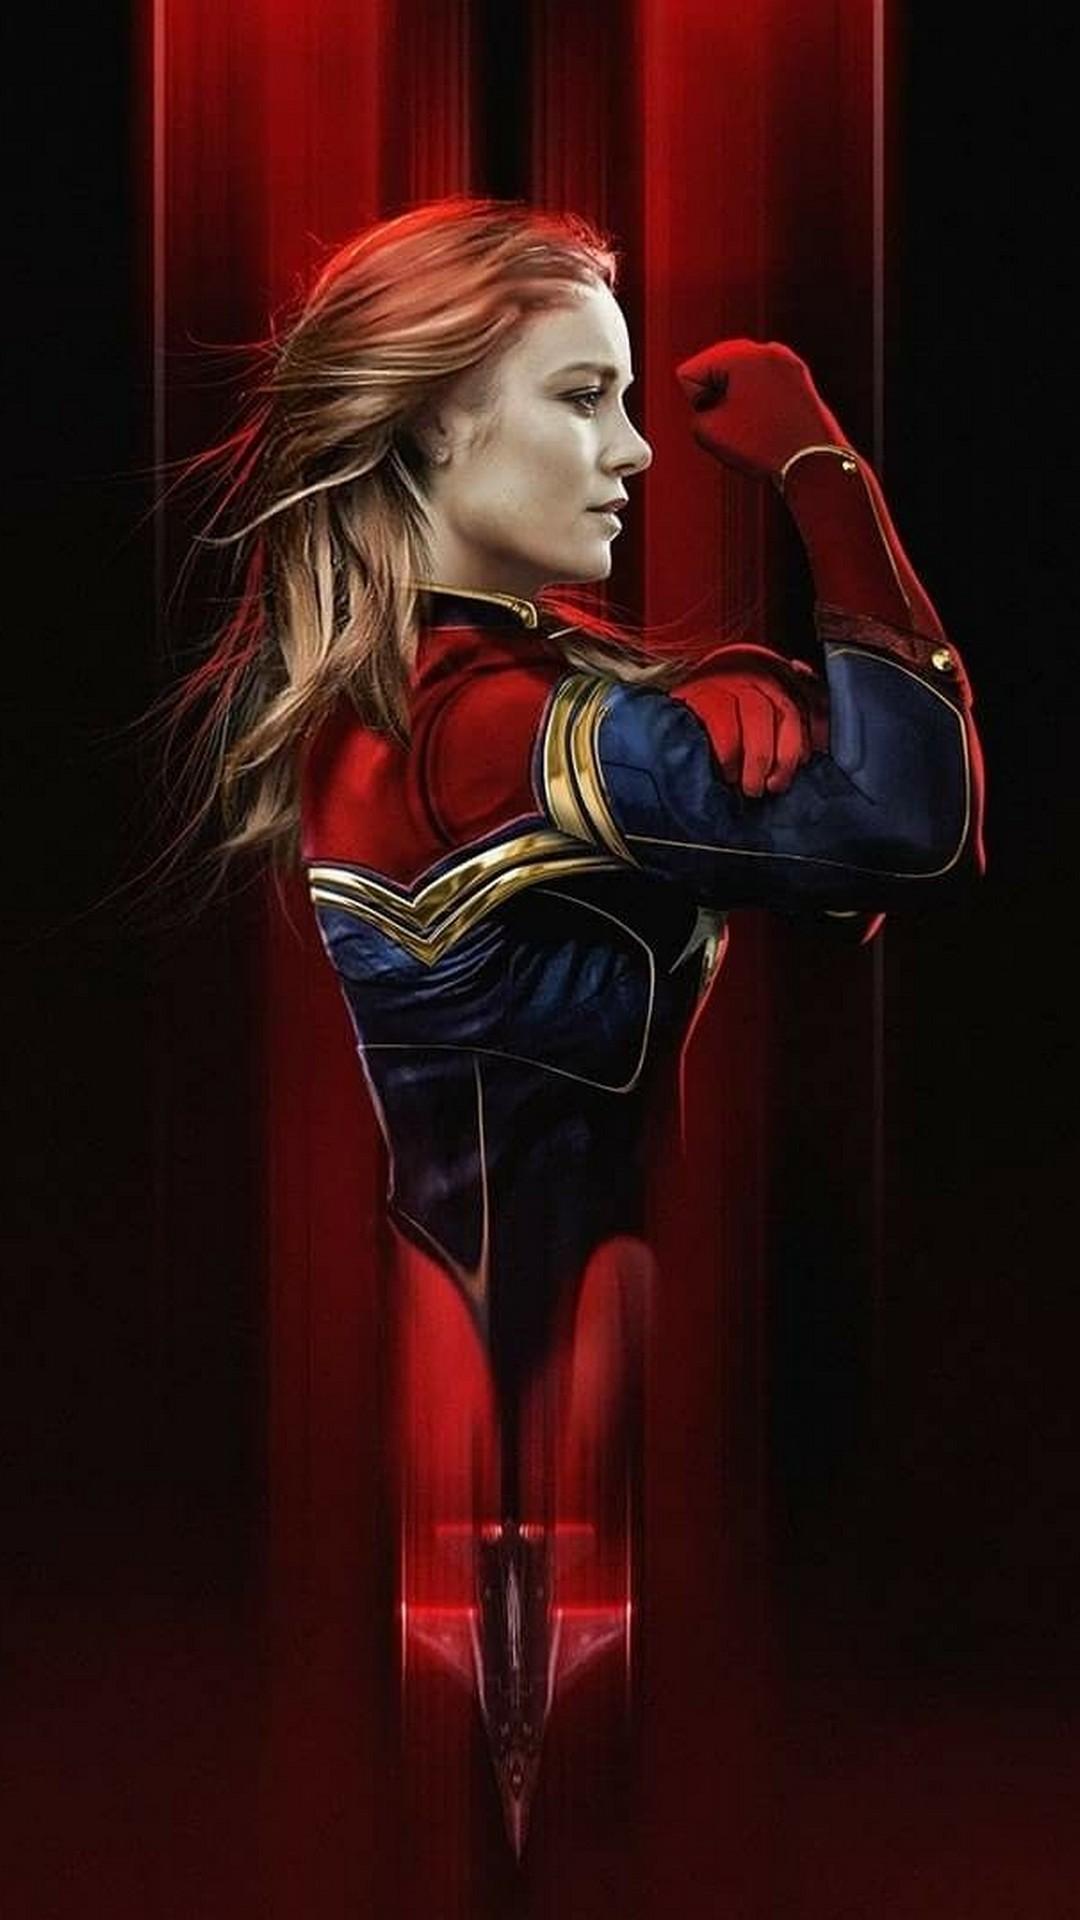 Start Download - Brie Larson Captain Marvel Wallpaper Hd , HD Wallpaper & Backgrounds